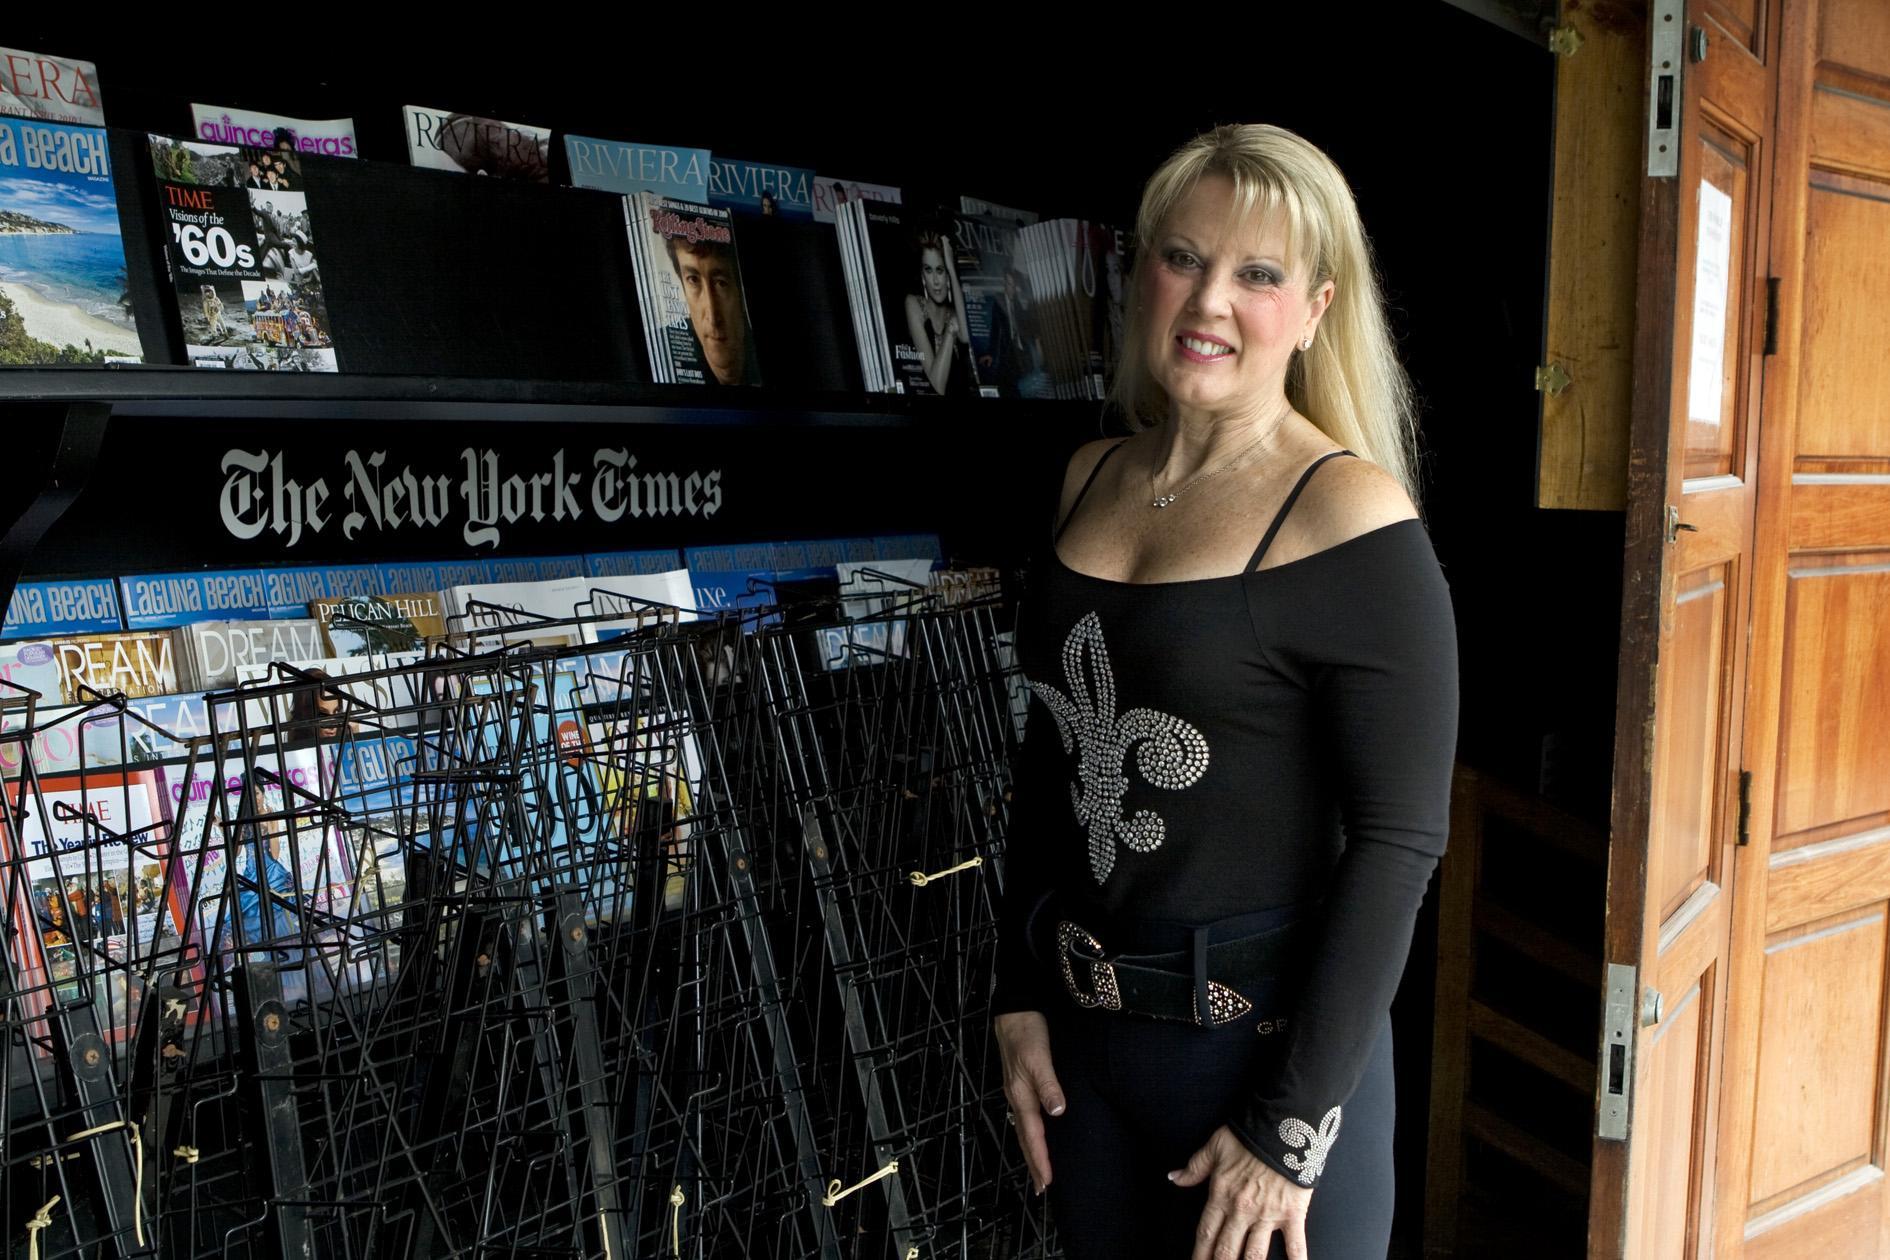 Heidi Miller, a downtown business owner, believes the foot patrol is helping deter shoplifting.